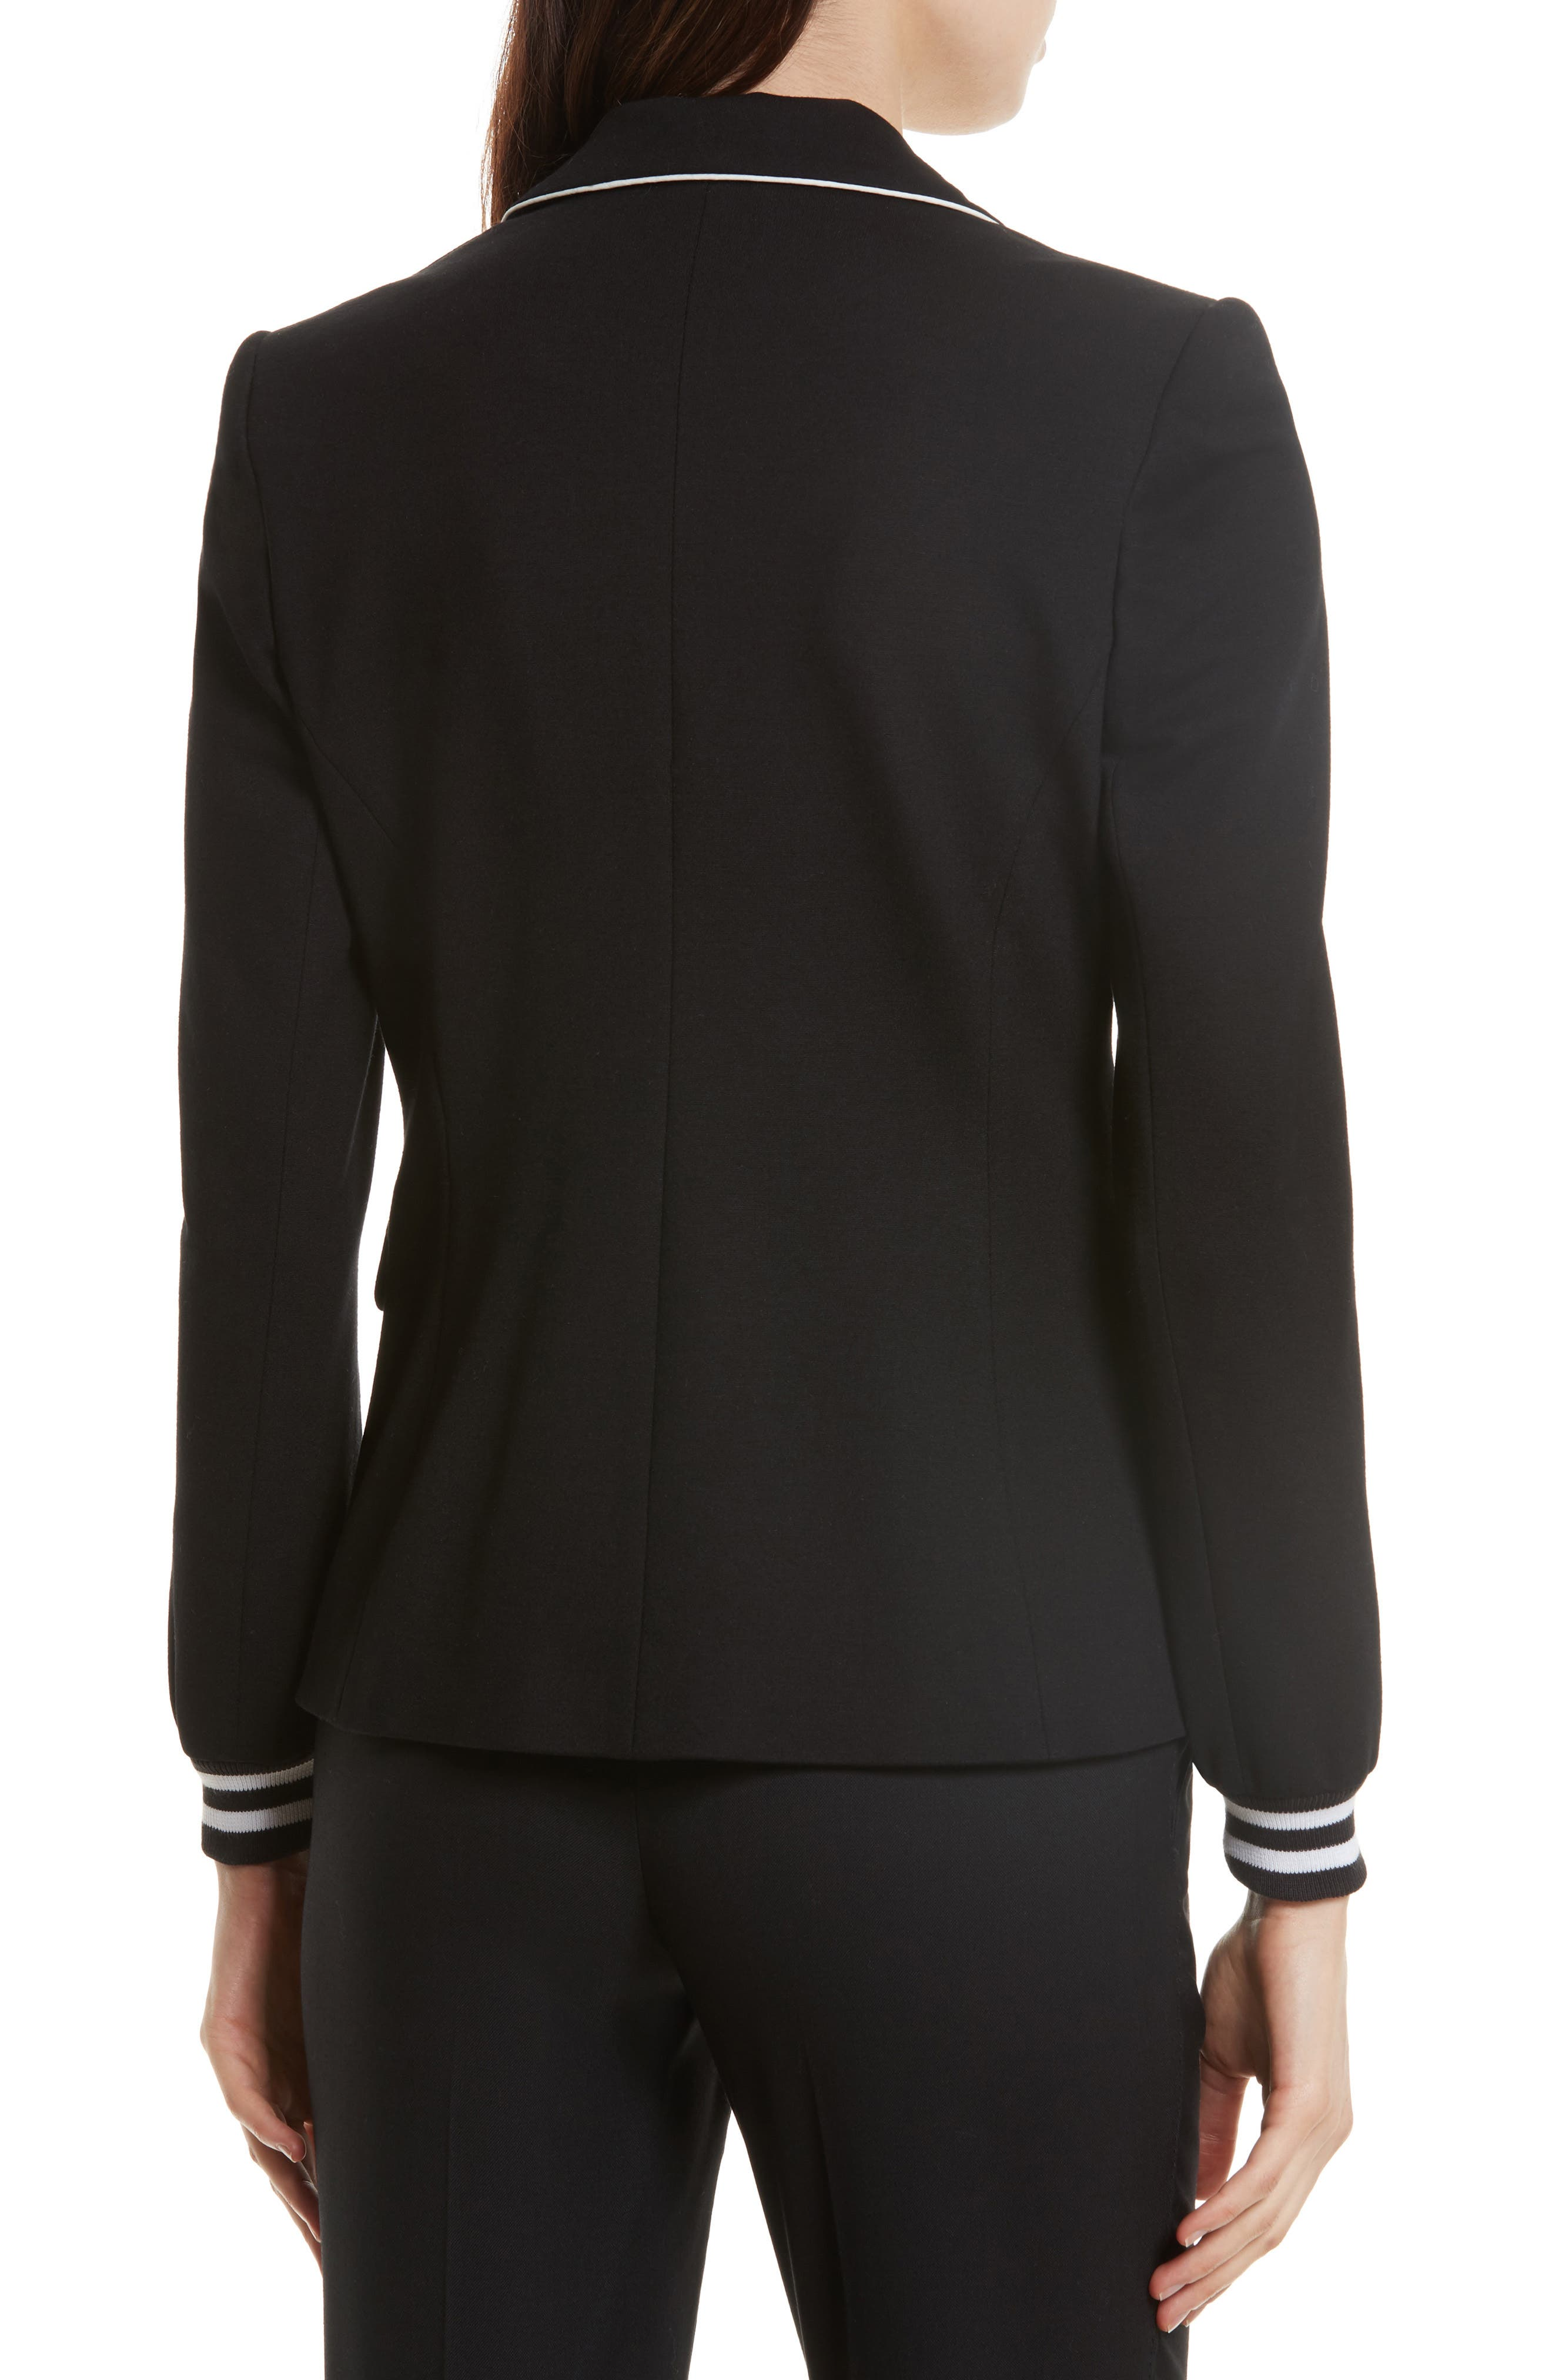 Piped Jersey Blazer,                             Alternate thumbnail 2, color,                             Black/ White